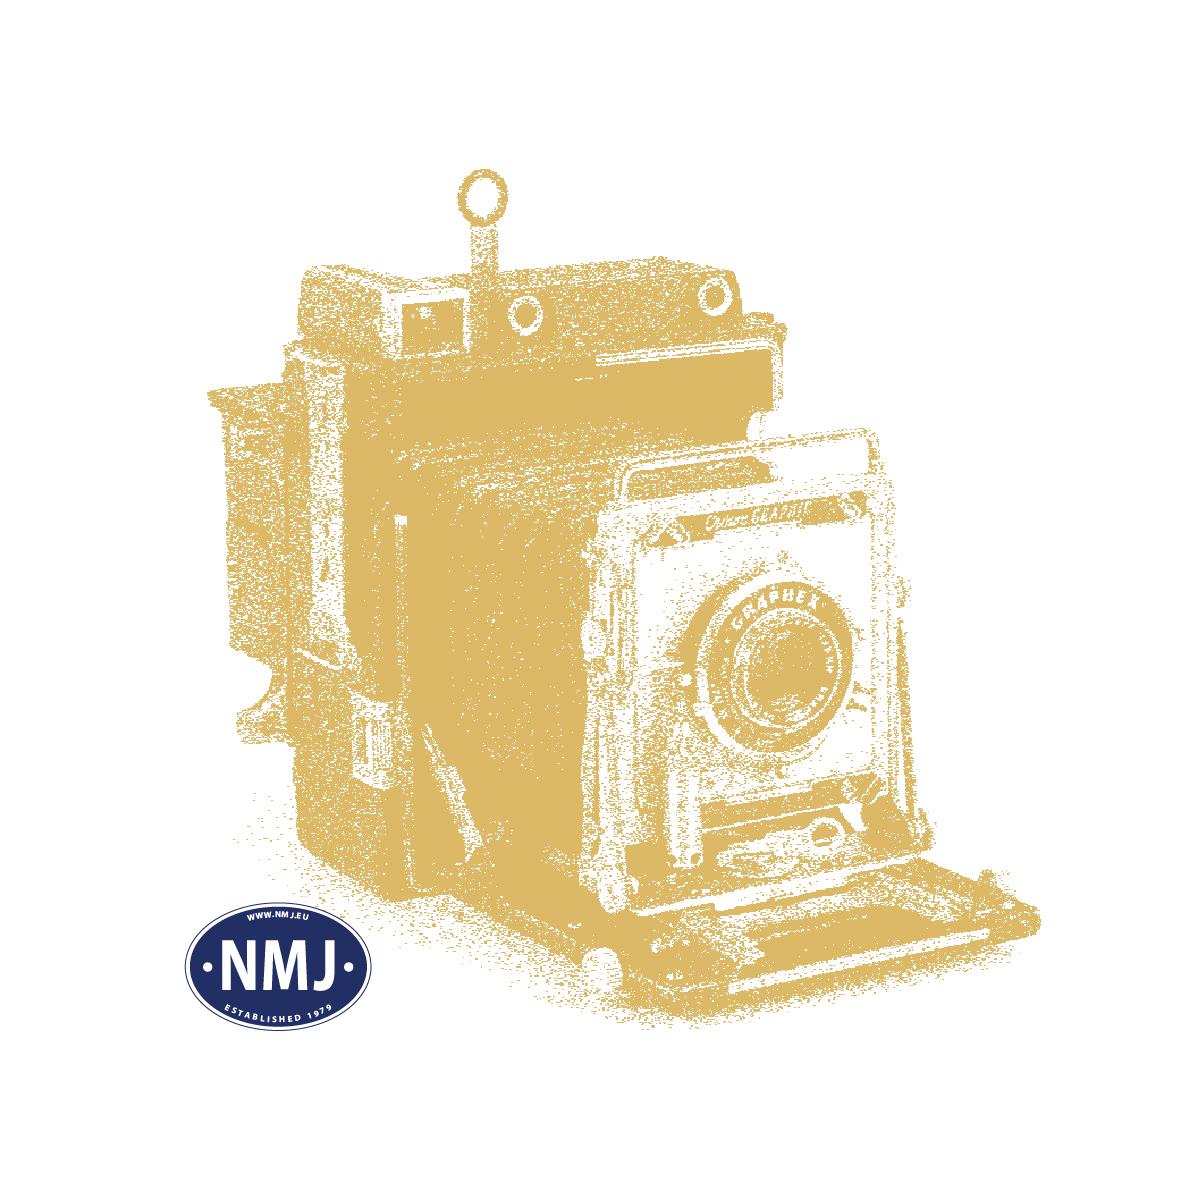 NMJT502.301 - NMJ Topline Kpbs 21 76 3 335 740-2 Rungenwagen NSB mit Beladung